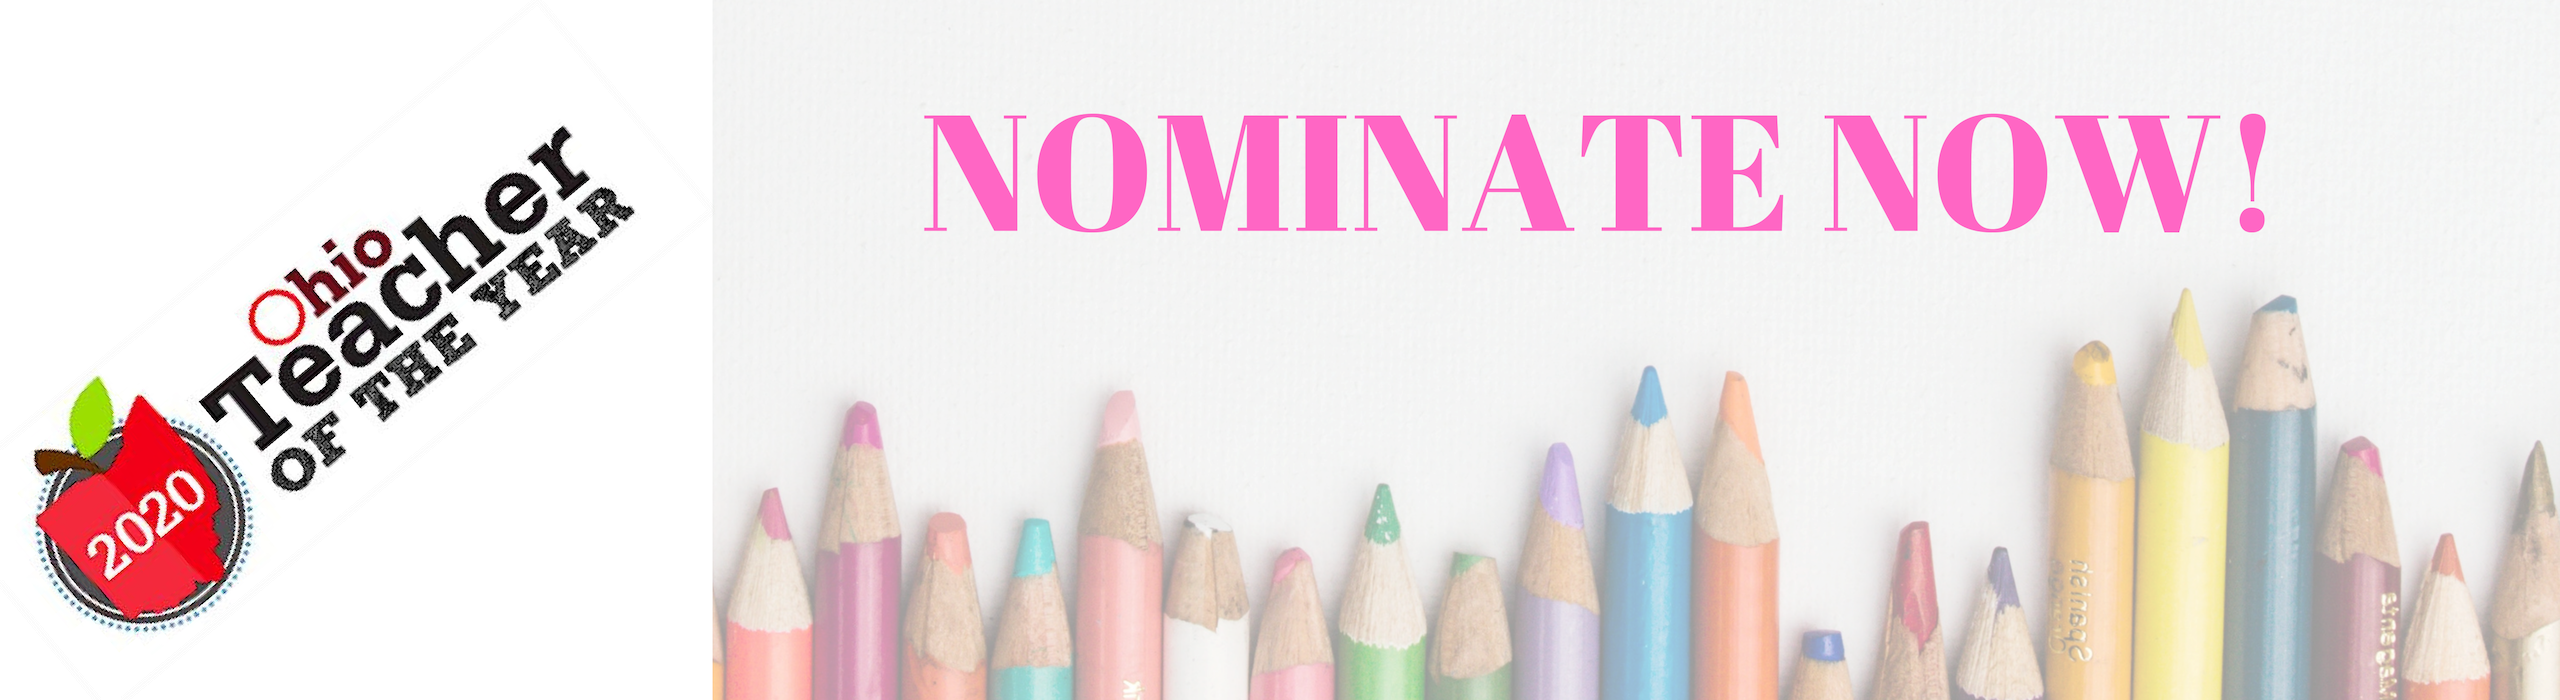 2020 Ohio Teacher of the Year - Nominate Now!